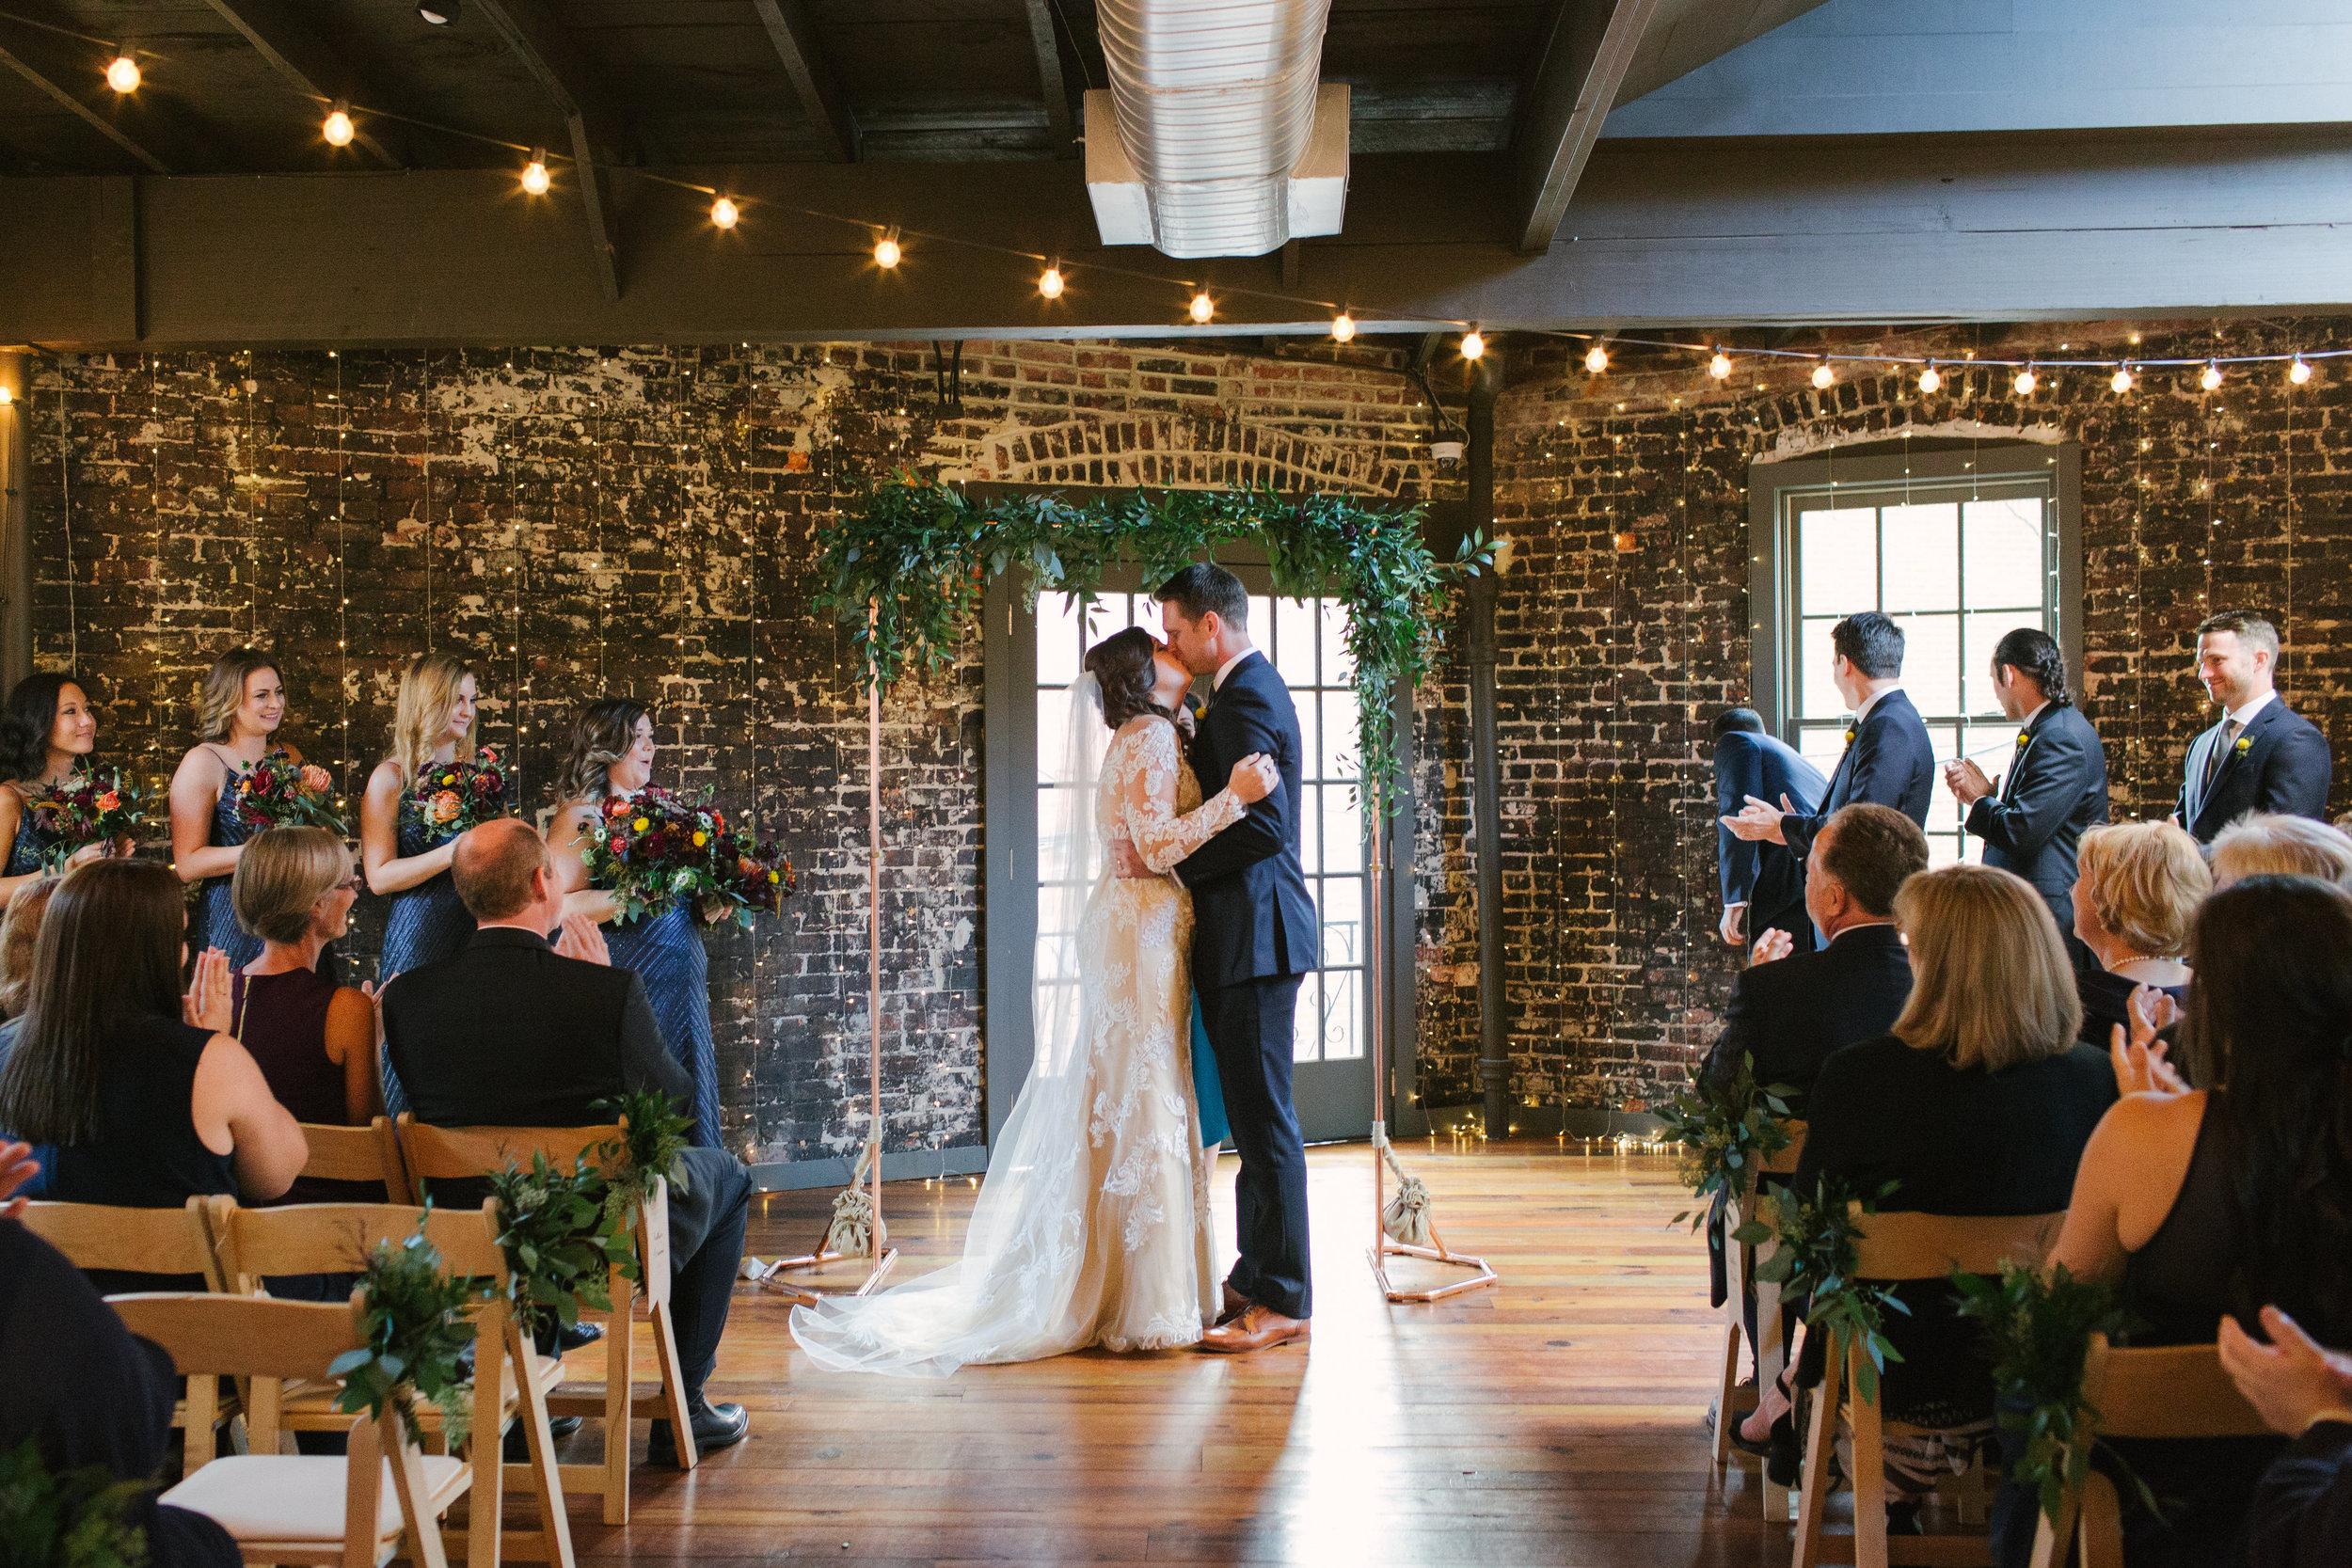 Dupon Circle Wedding | Washington DC Wedding Photography | Rebecca Wilcher Photography -9.jpg